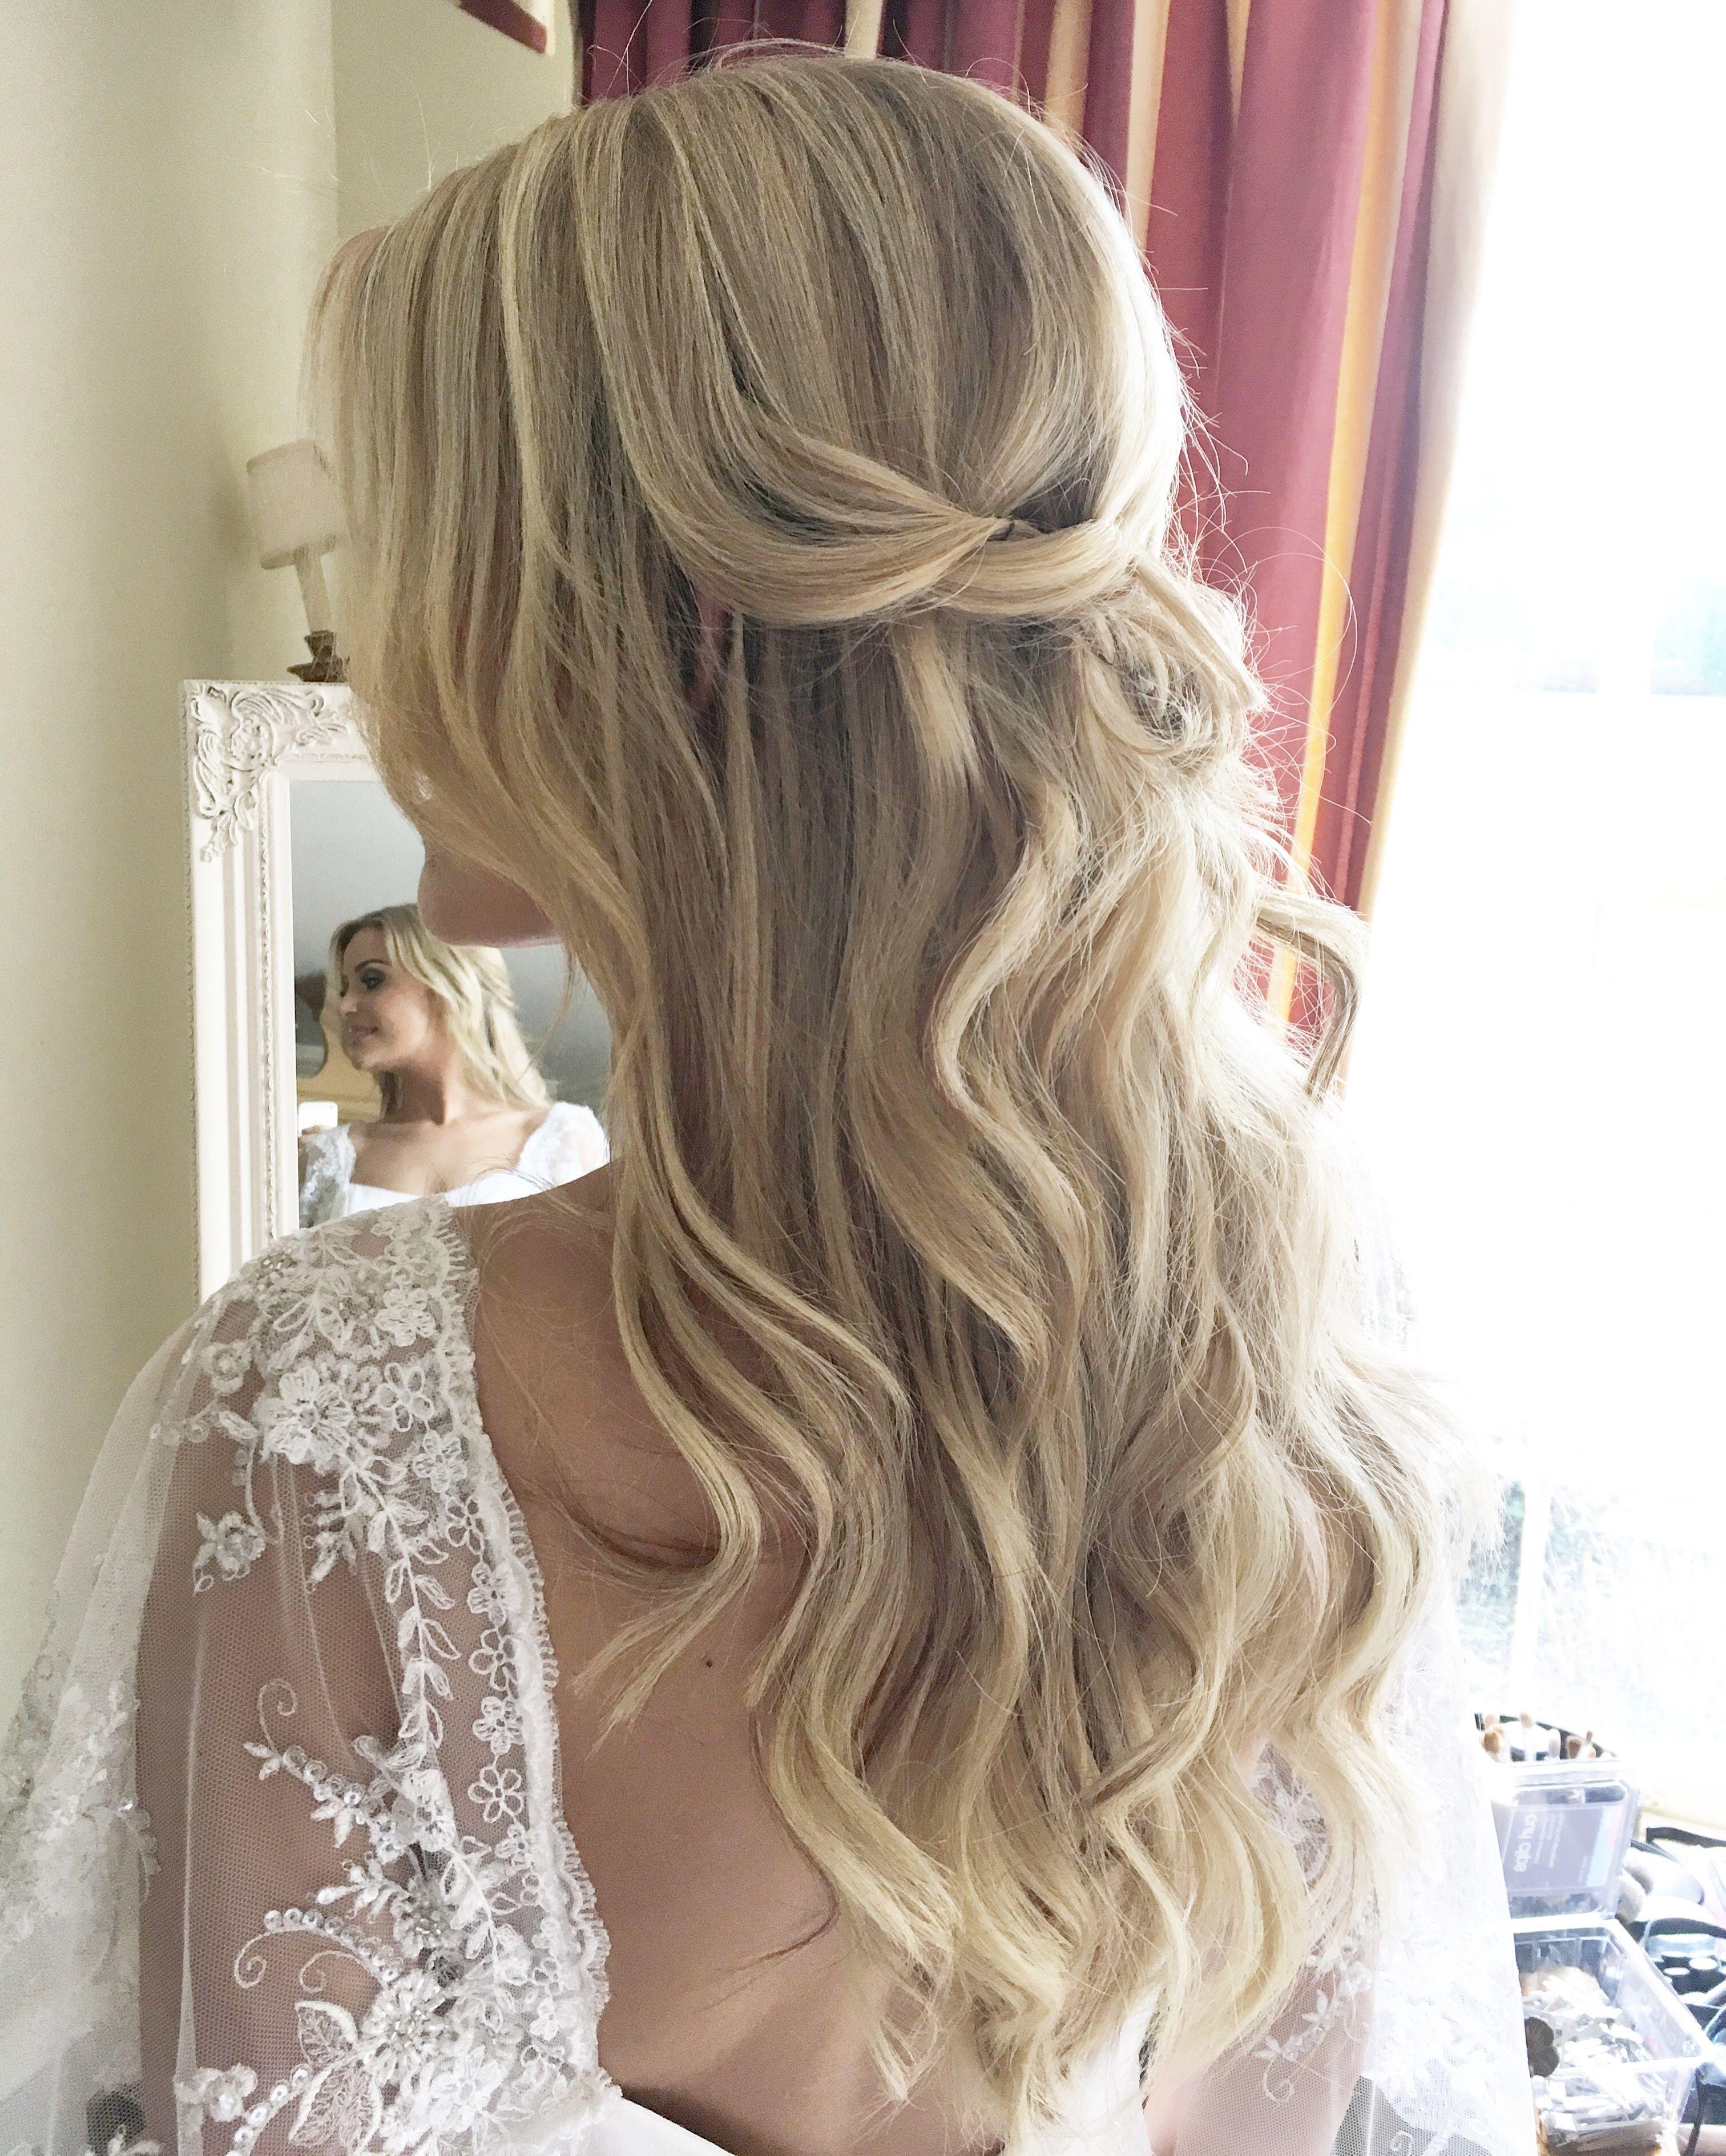 Boho Hairstyle Wedding Hair Styles Long Hair Styles Boho Hairstyles